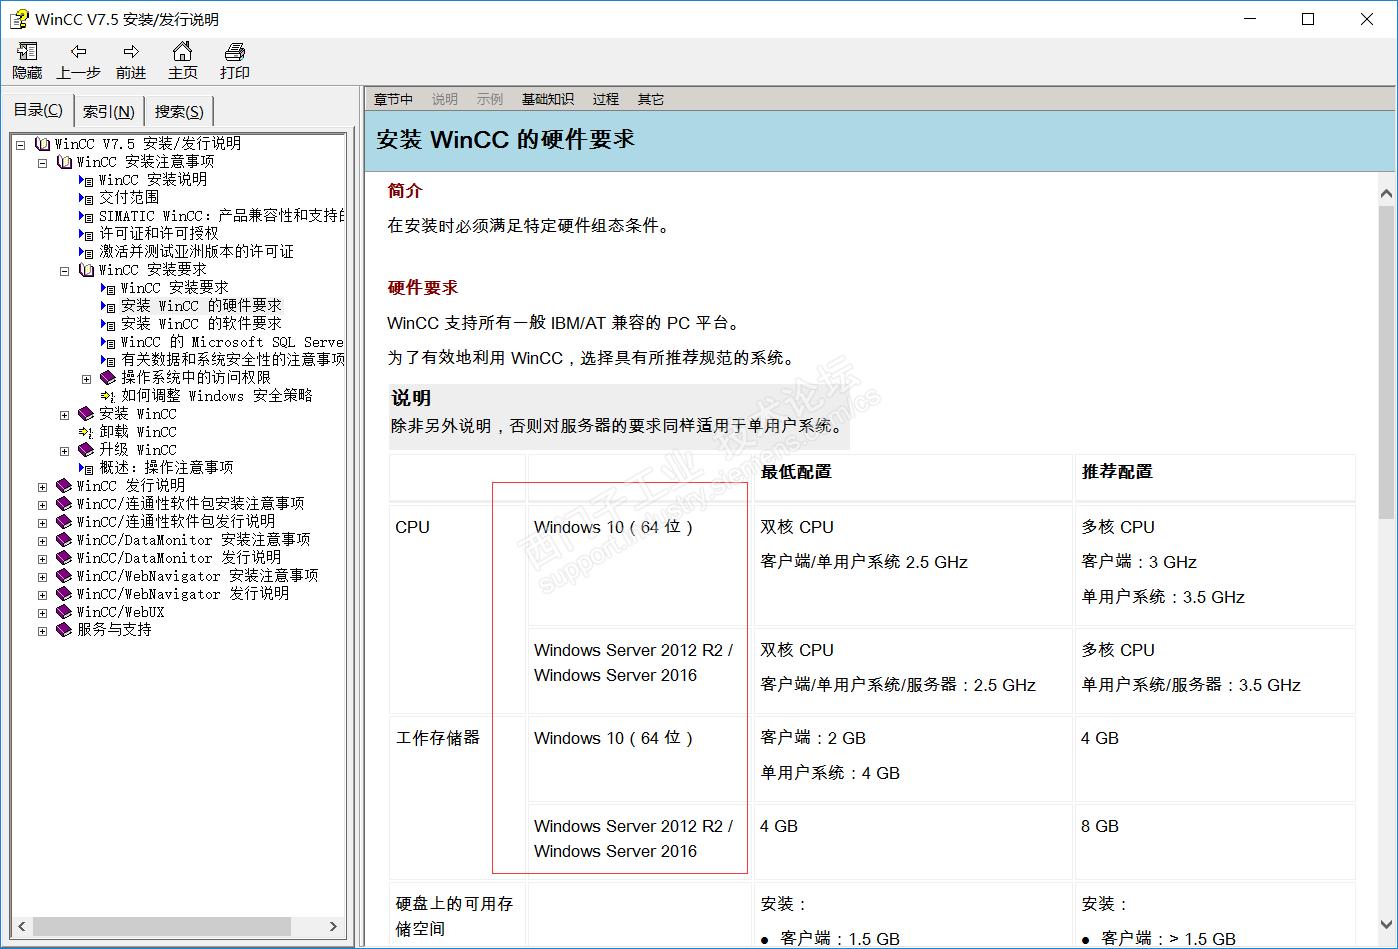 WinCC7.5完美破解版功能